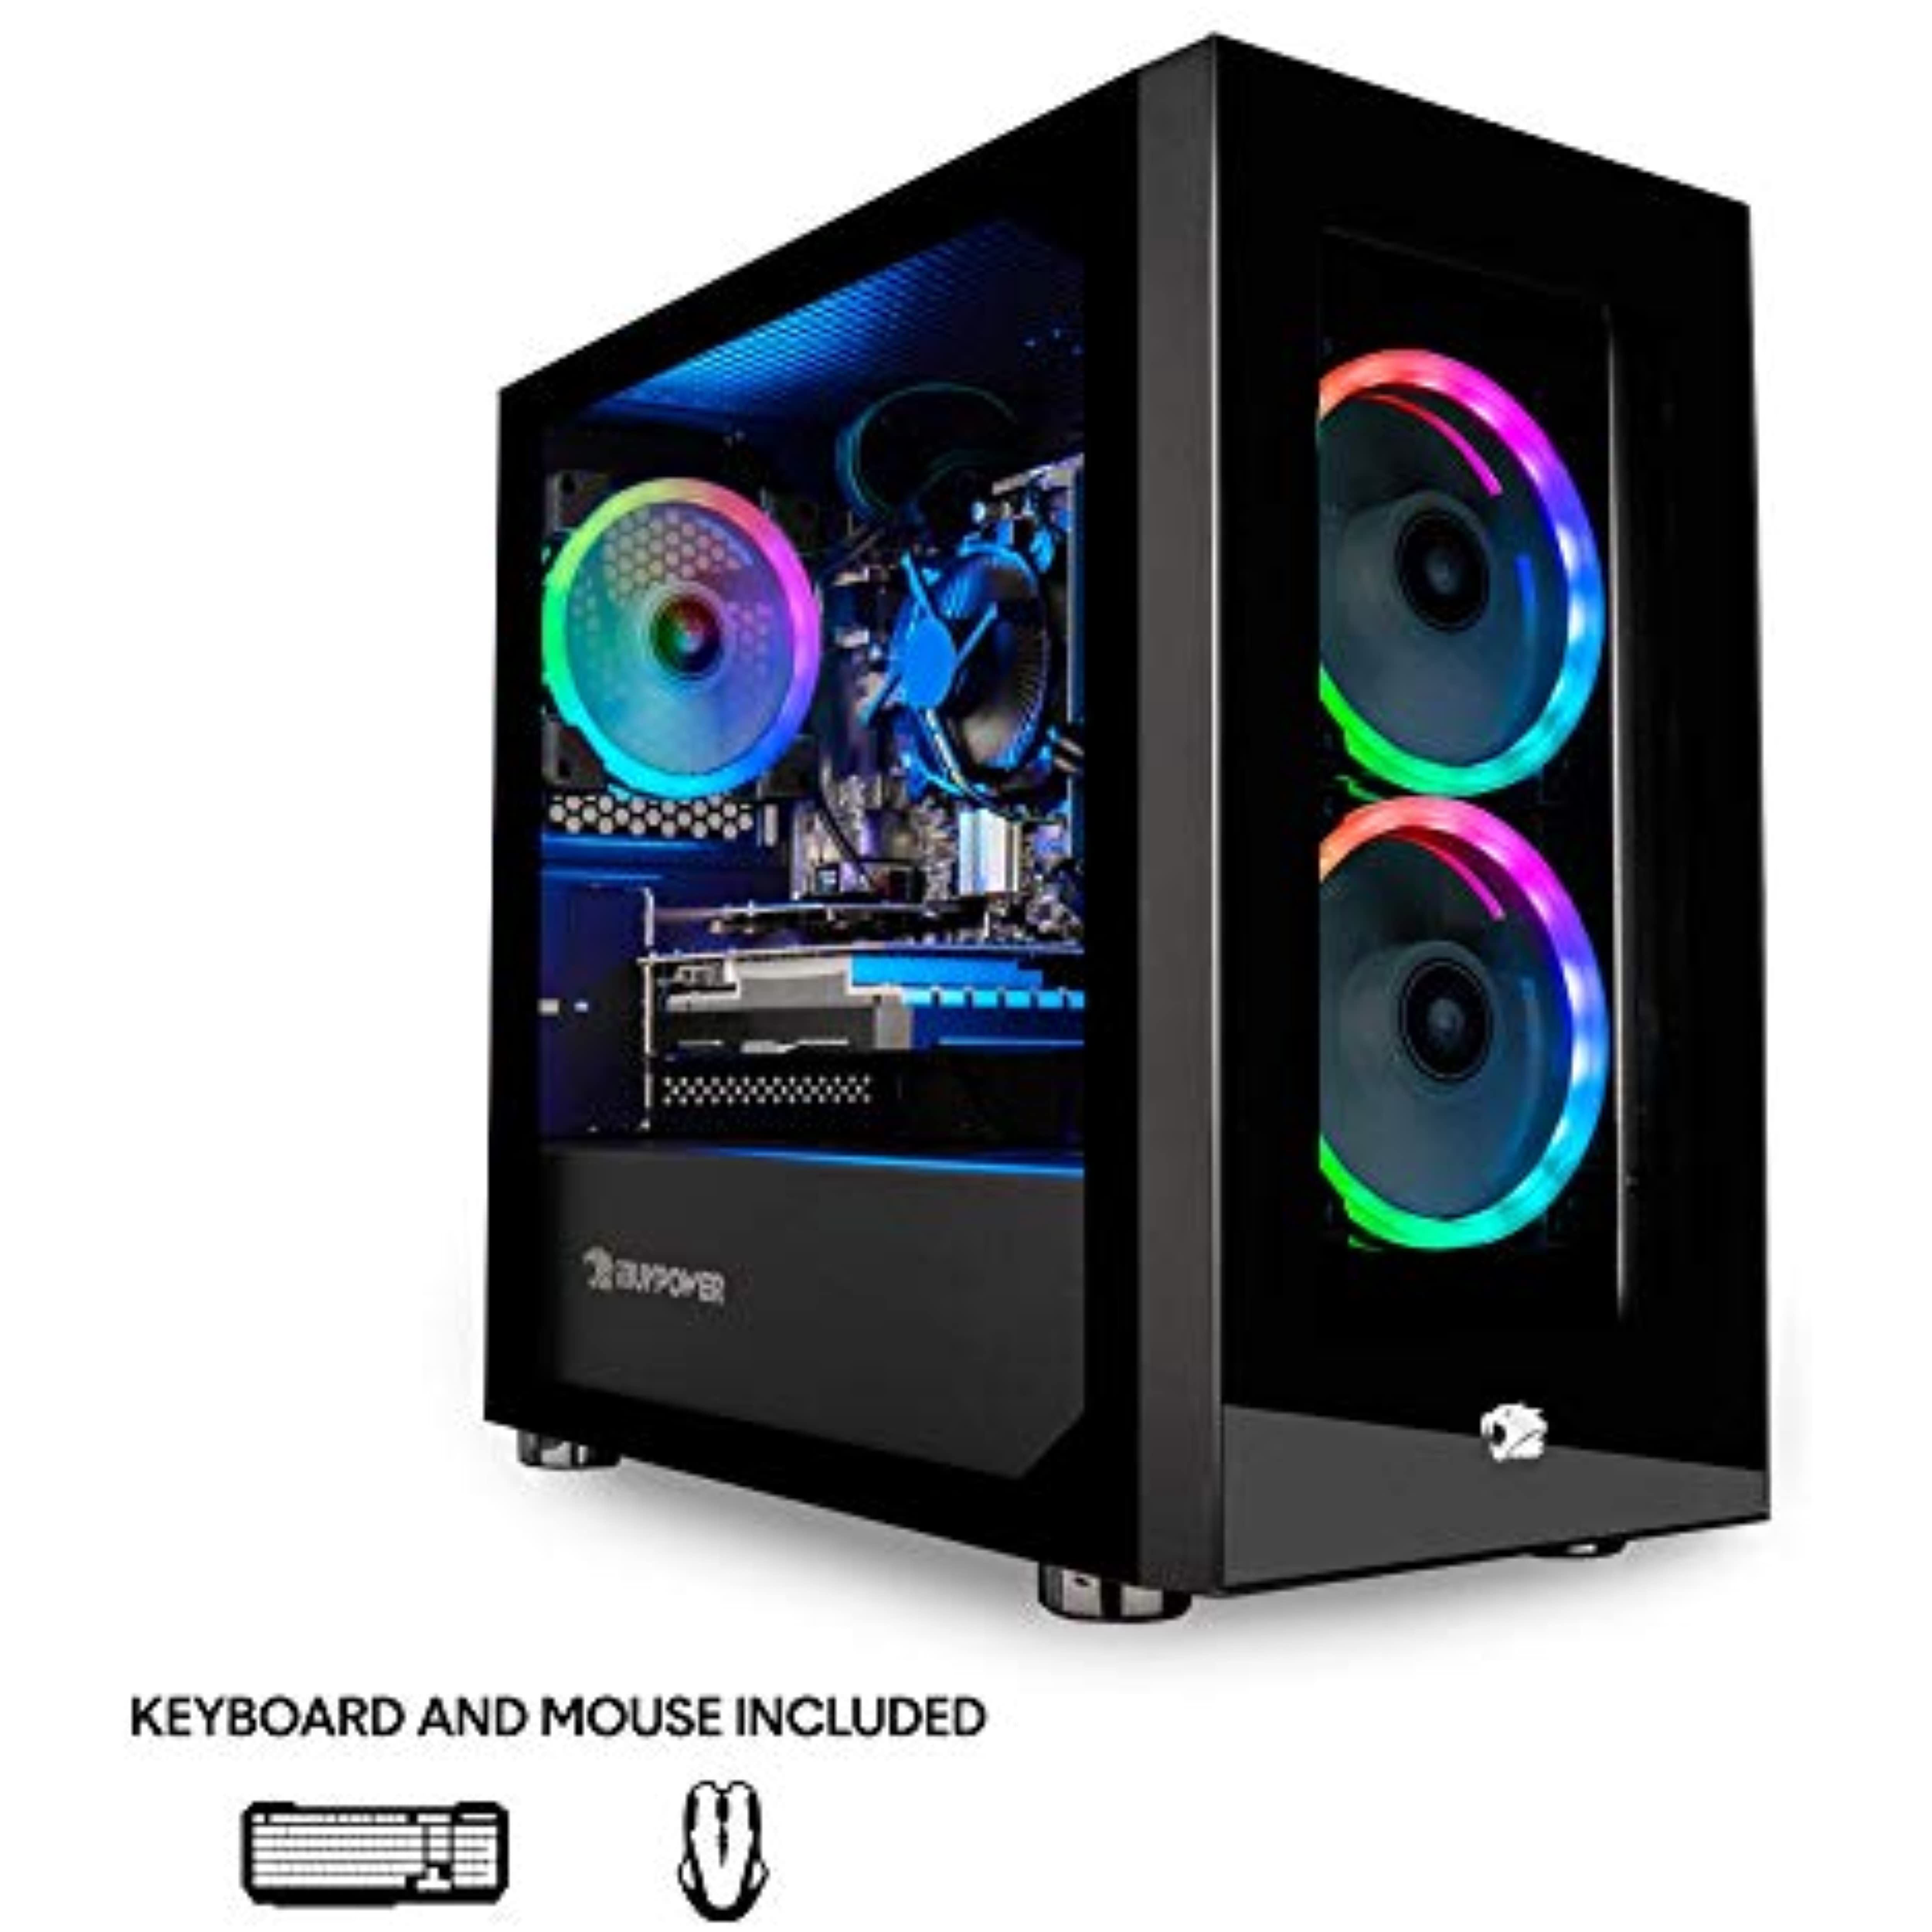 Ibuypower Gaming Pc Computer Desktop Element Mini 9300 Amd Ryzen 3 3100 3 6ghz Ddr4 Ram Gaming Pcs Gaming Pc